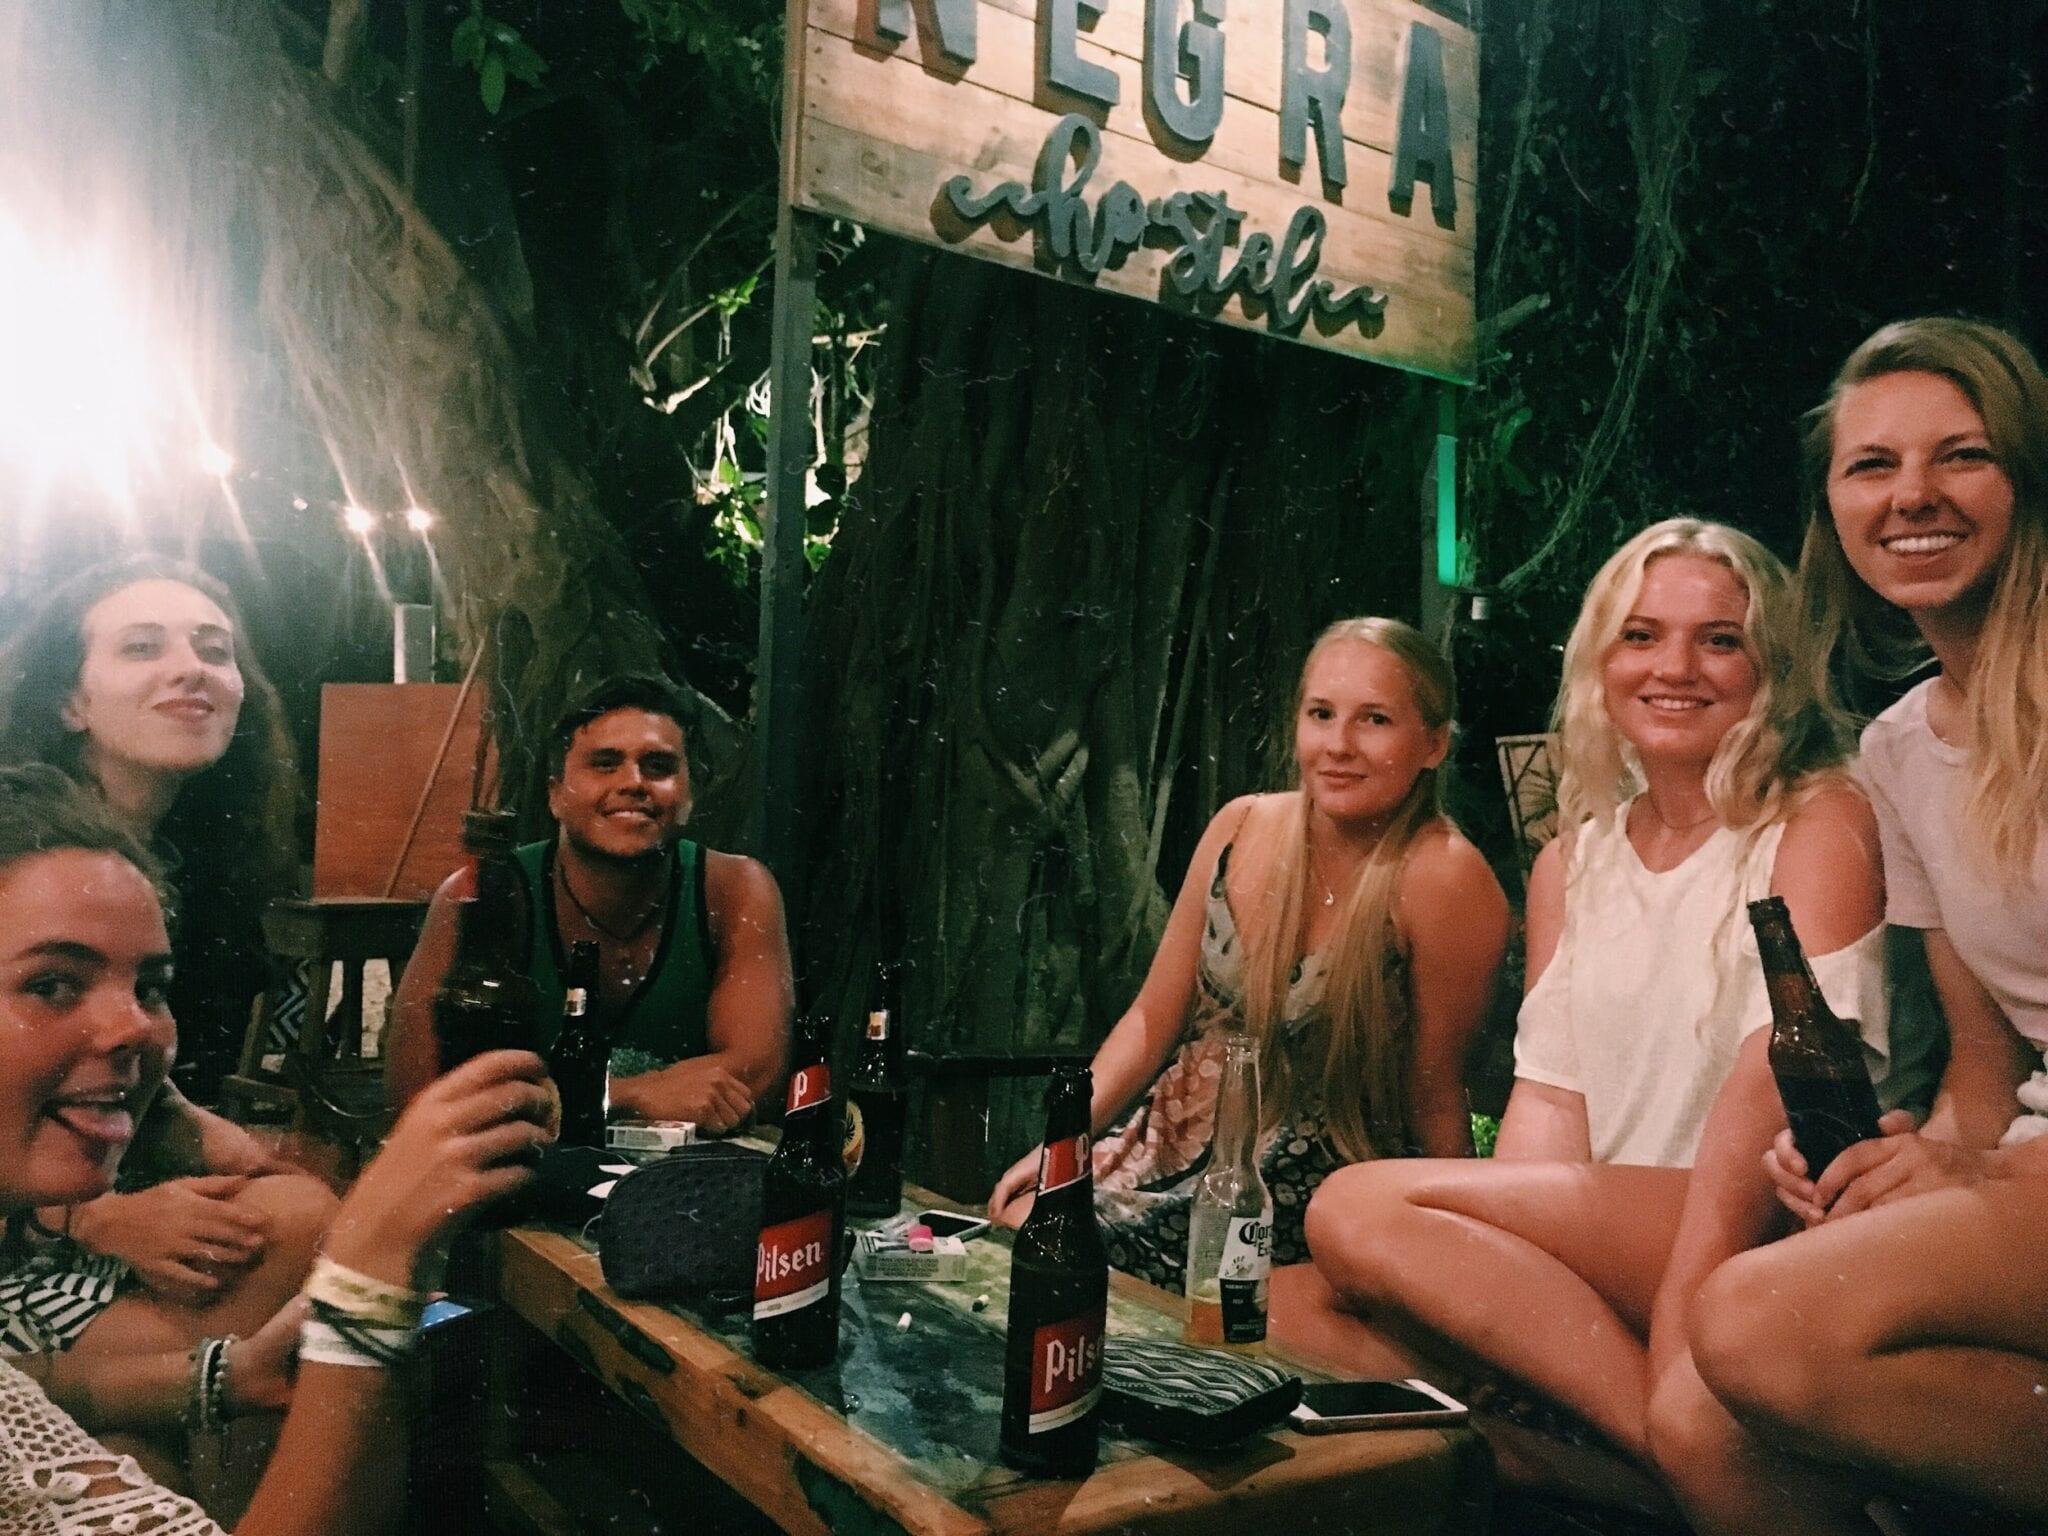 Friends at Oveja Negra Open mic night.